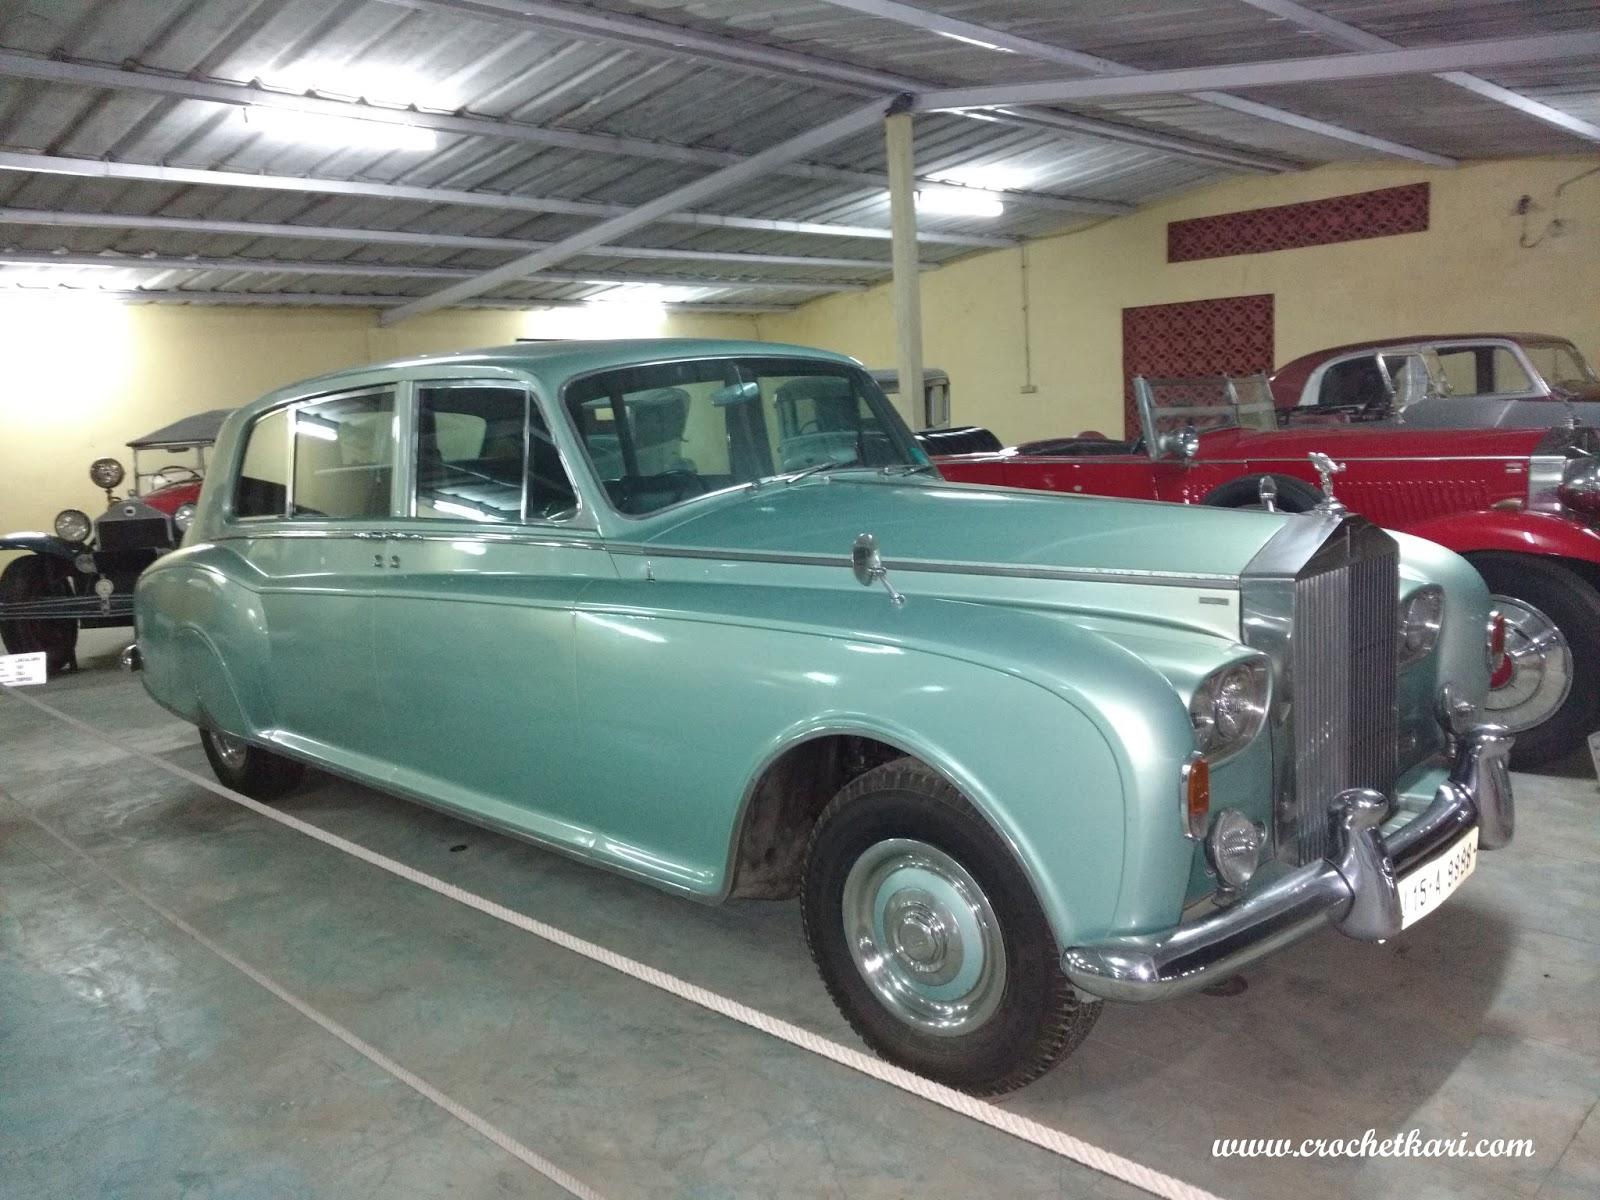 Crochetkari: Vintage Car Museum, Ahmedabad